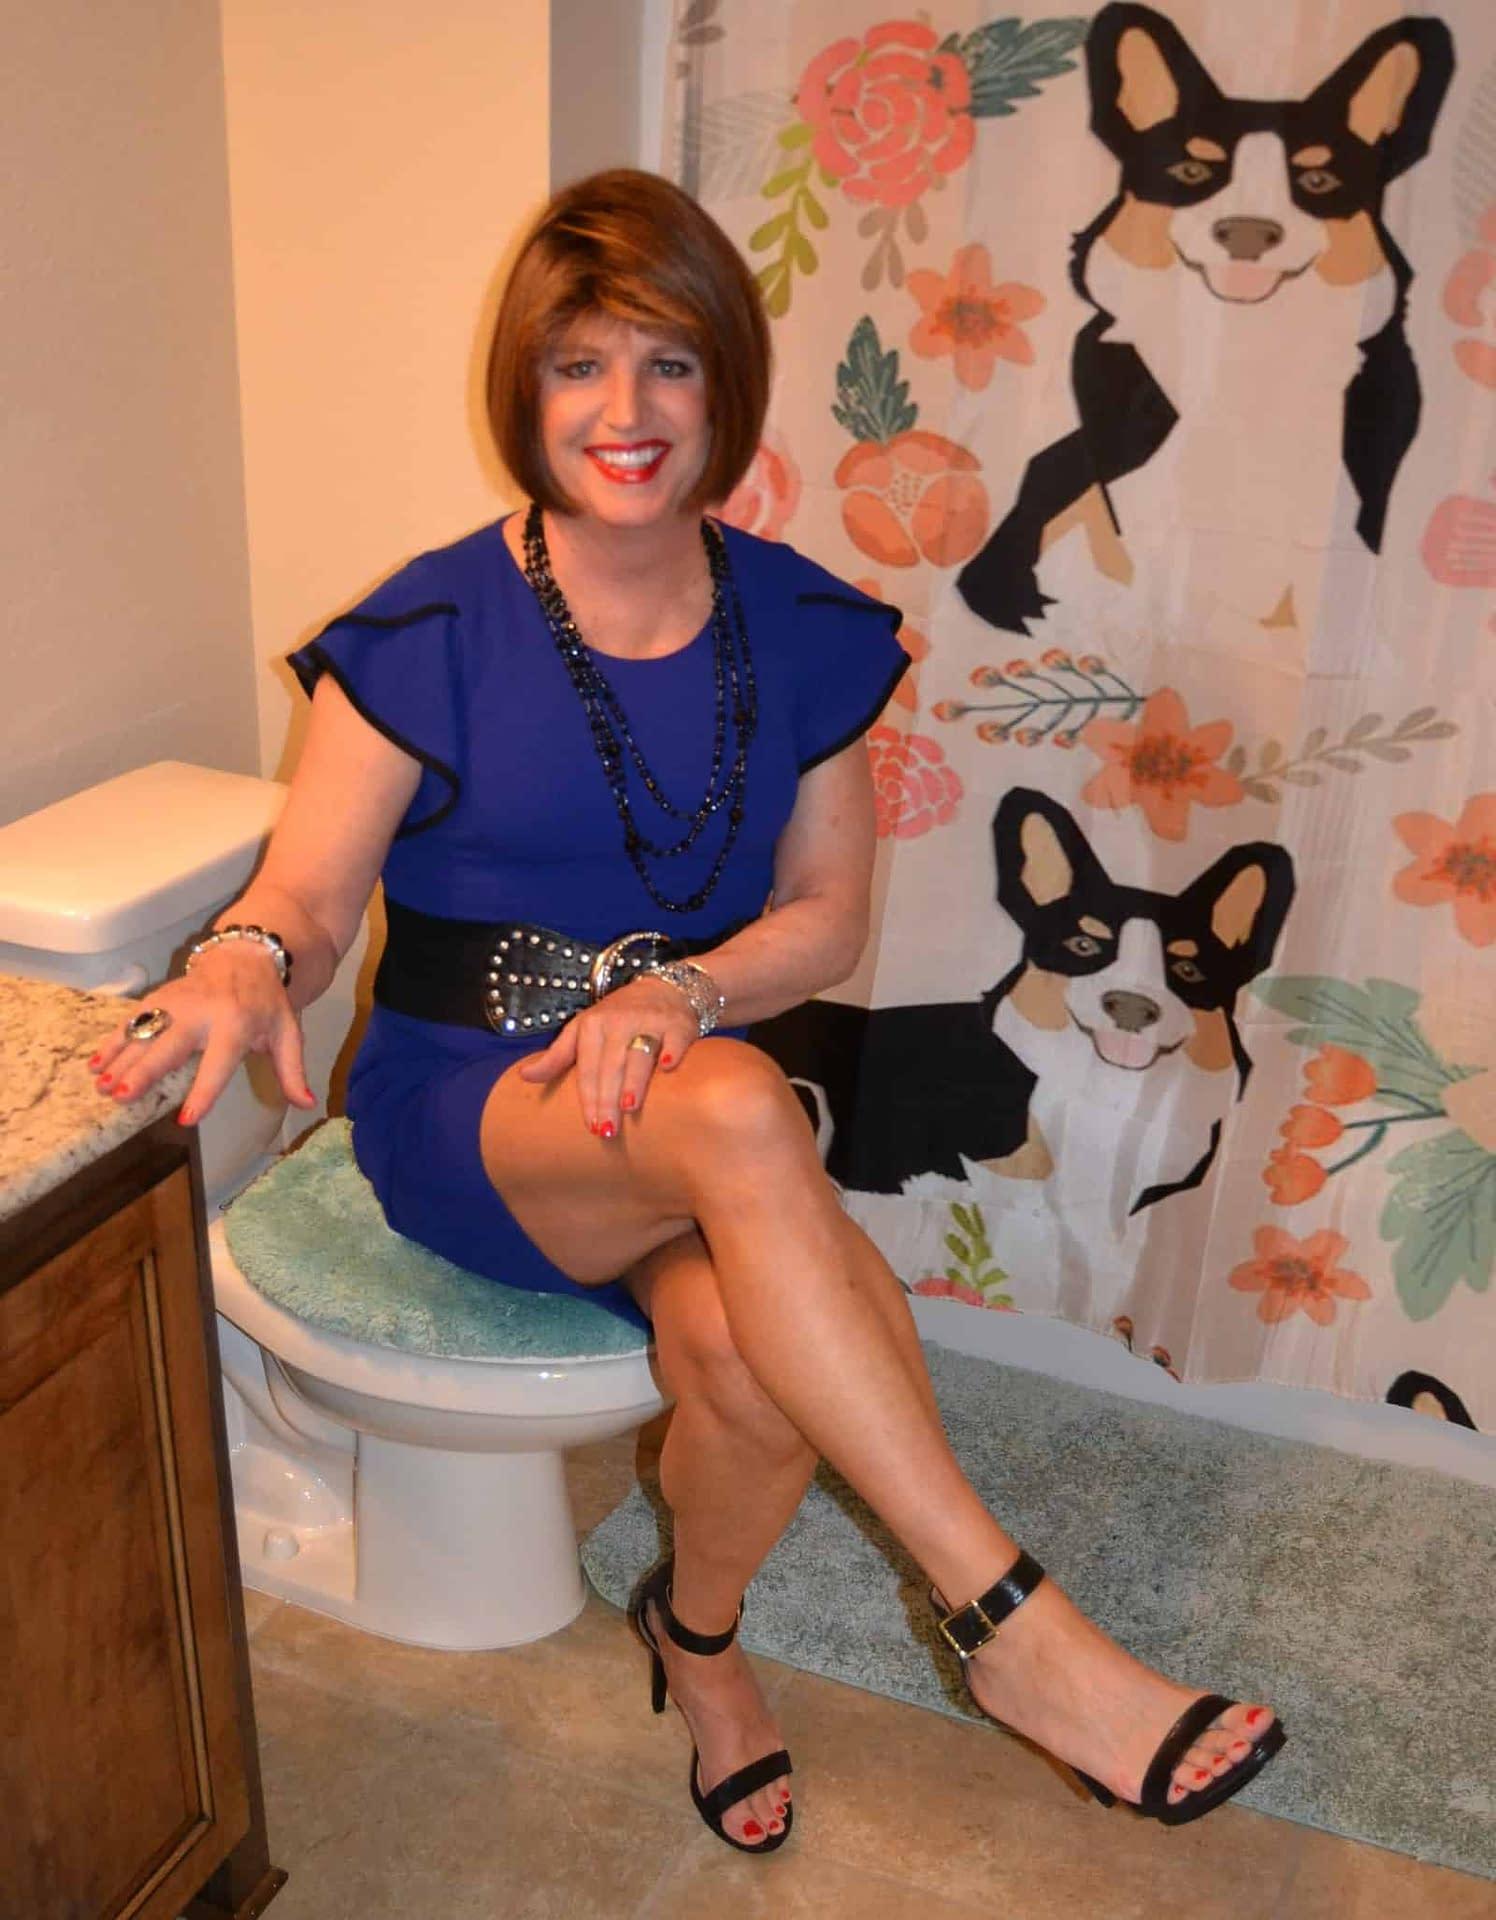 Yep, the Corgi bathroom is where I make my makeup adjustments!